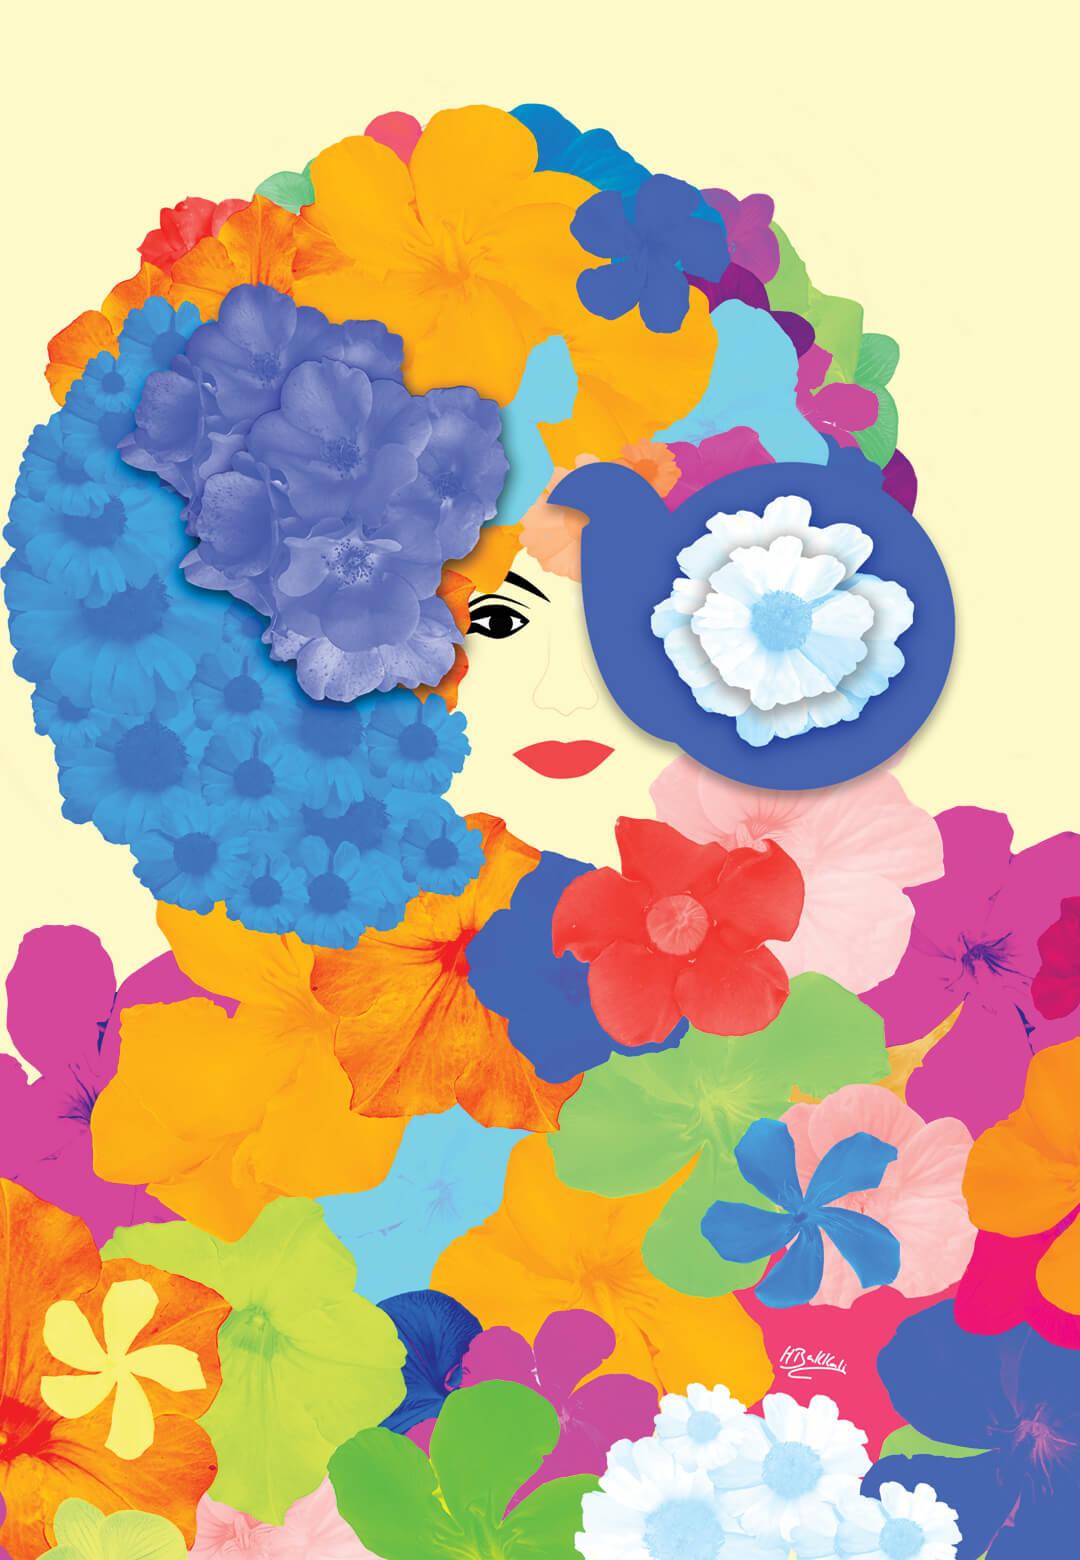 The Flowers of Happiness by Houda Bakkali | STIRworld